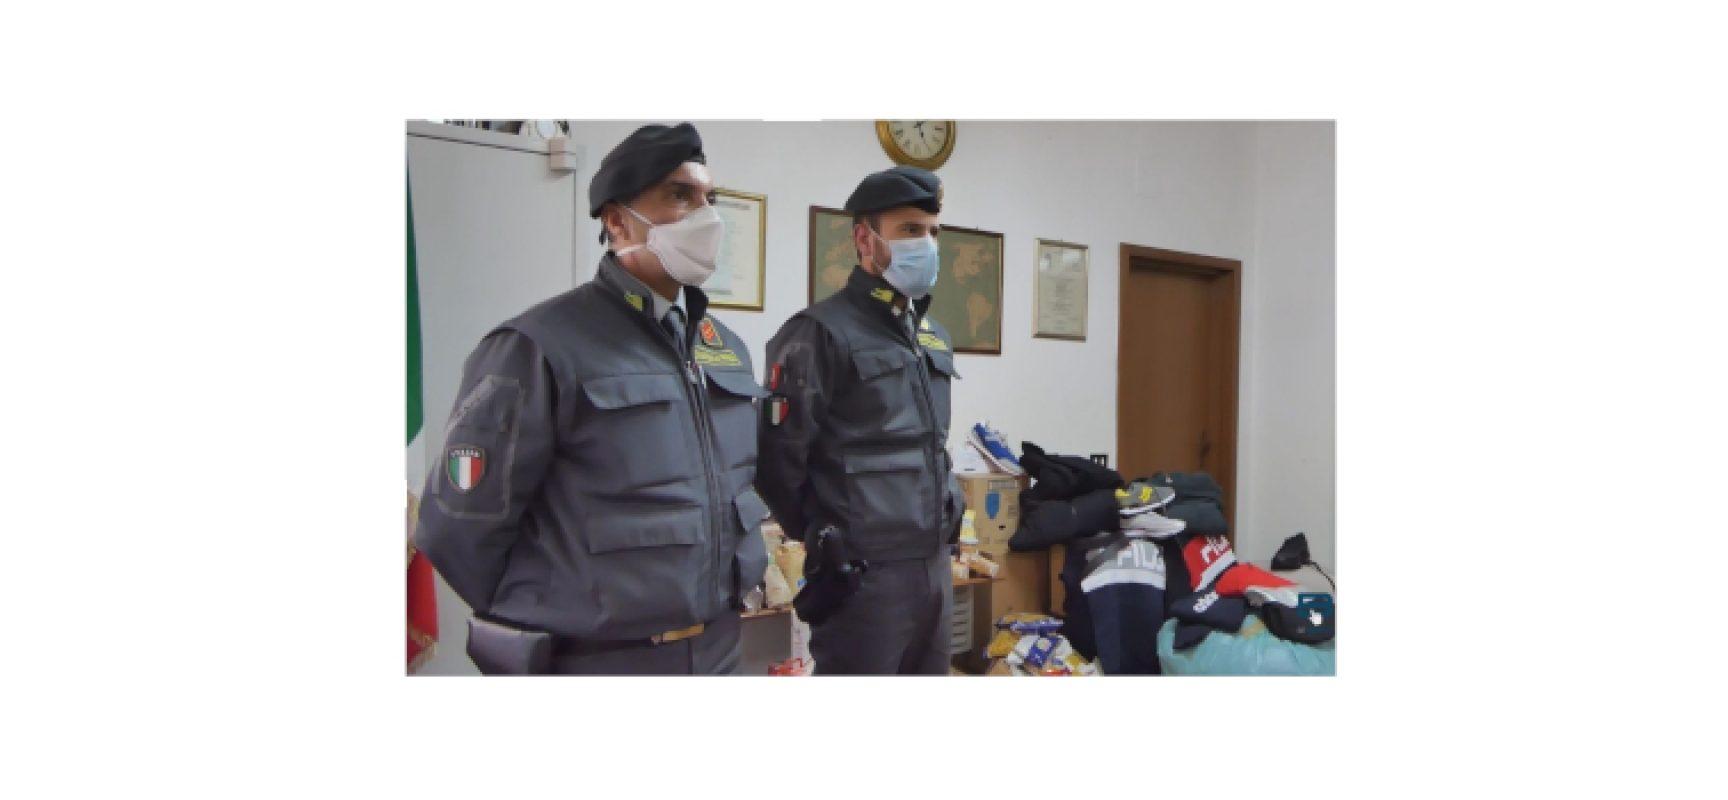 Guardia di Finanza dona capi di abbigliamento a Caritas di Bisceglie